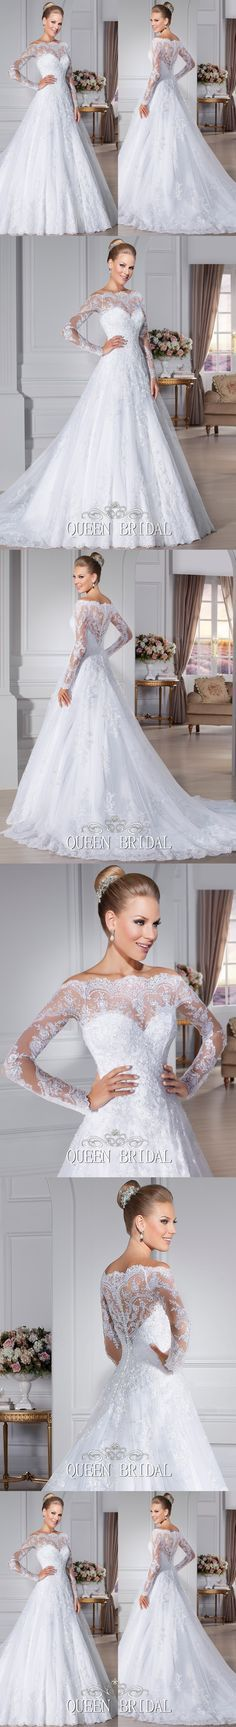 White long sleeve lace wedding dresses 2015 vintage a-line bridal dress wedding gown vestido de noiva manga longa H14